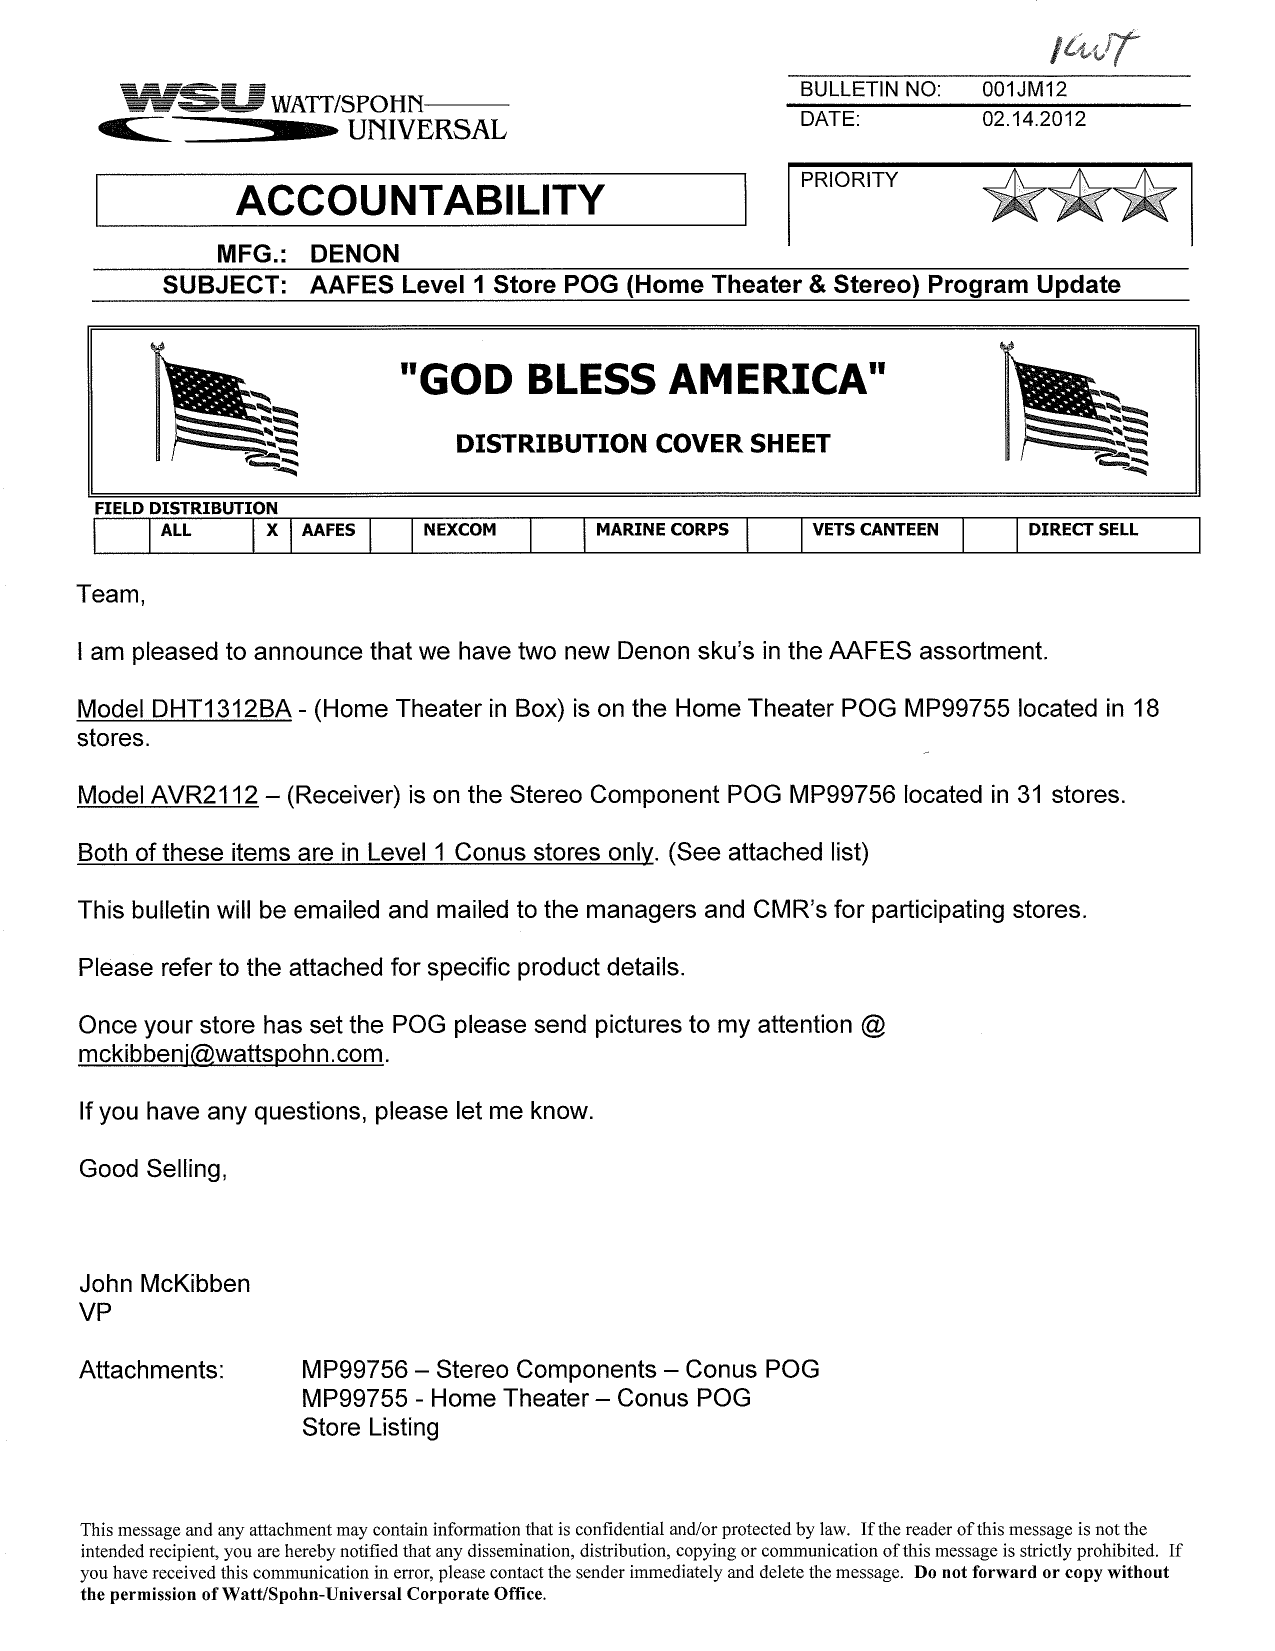 PDF manual for Sony Home Theater BRAVIA BDV-E780W